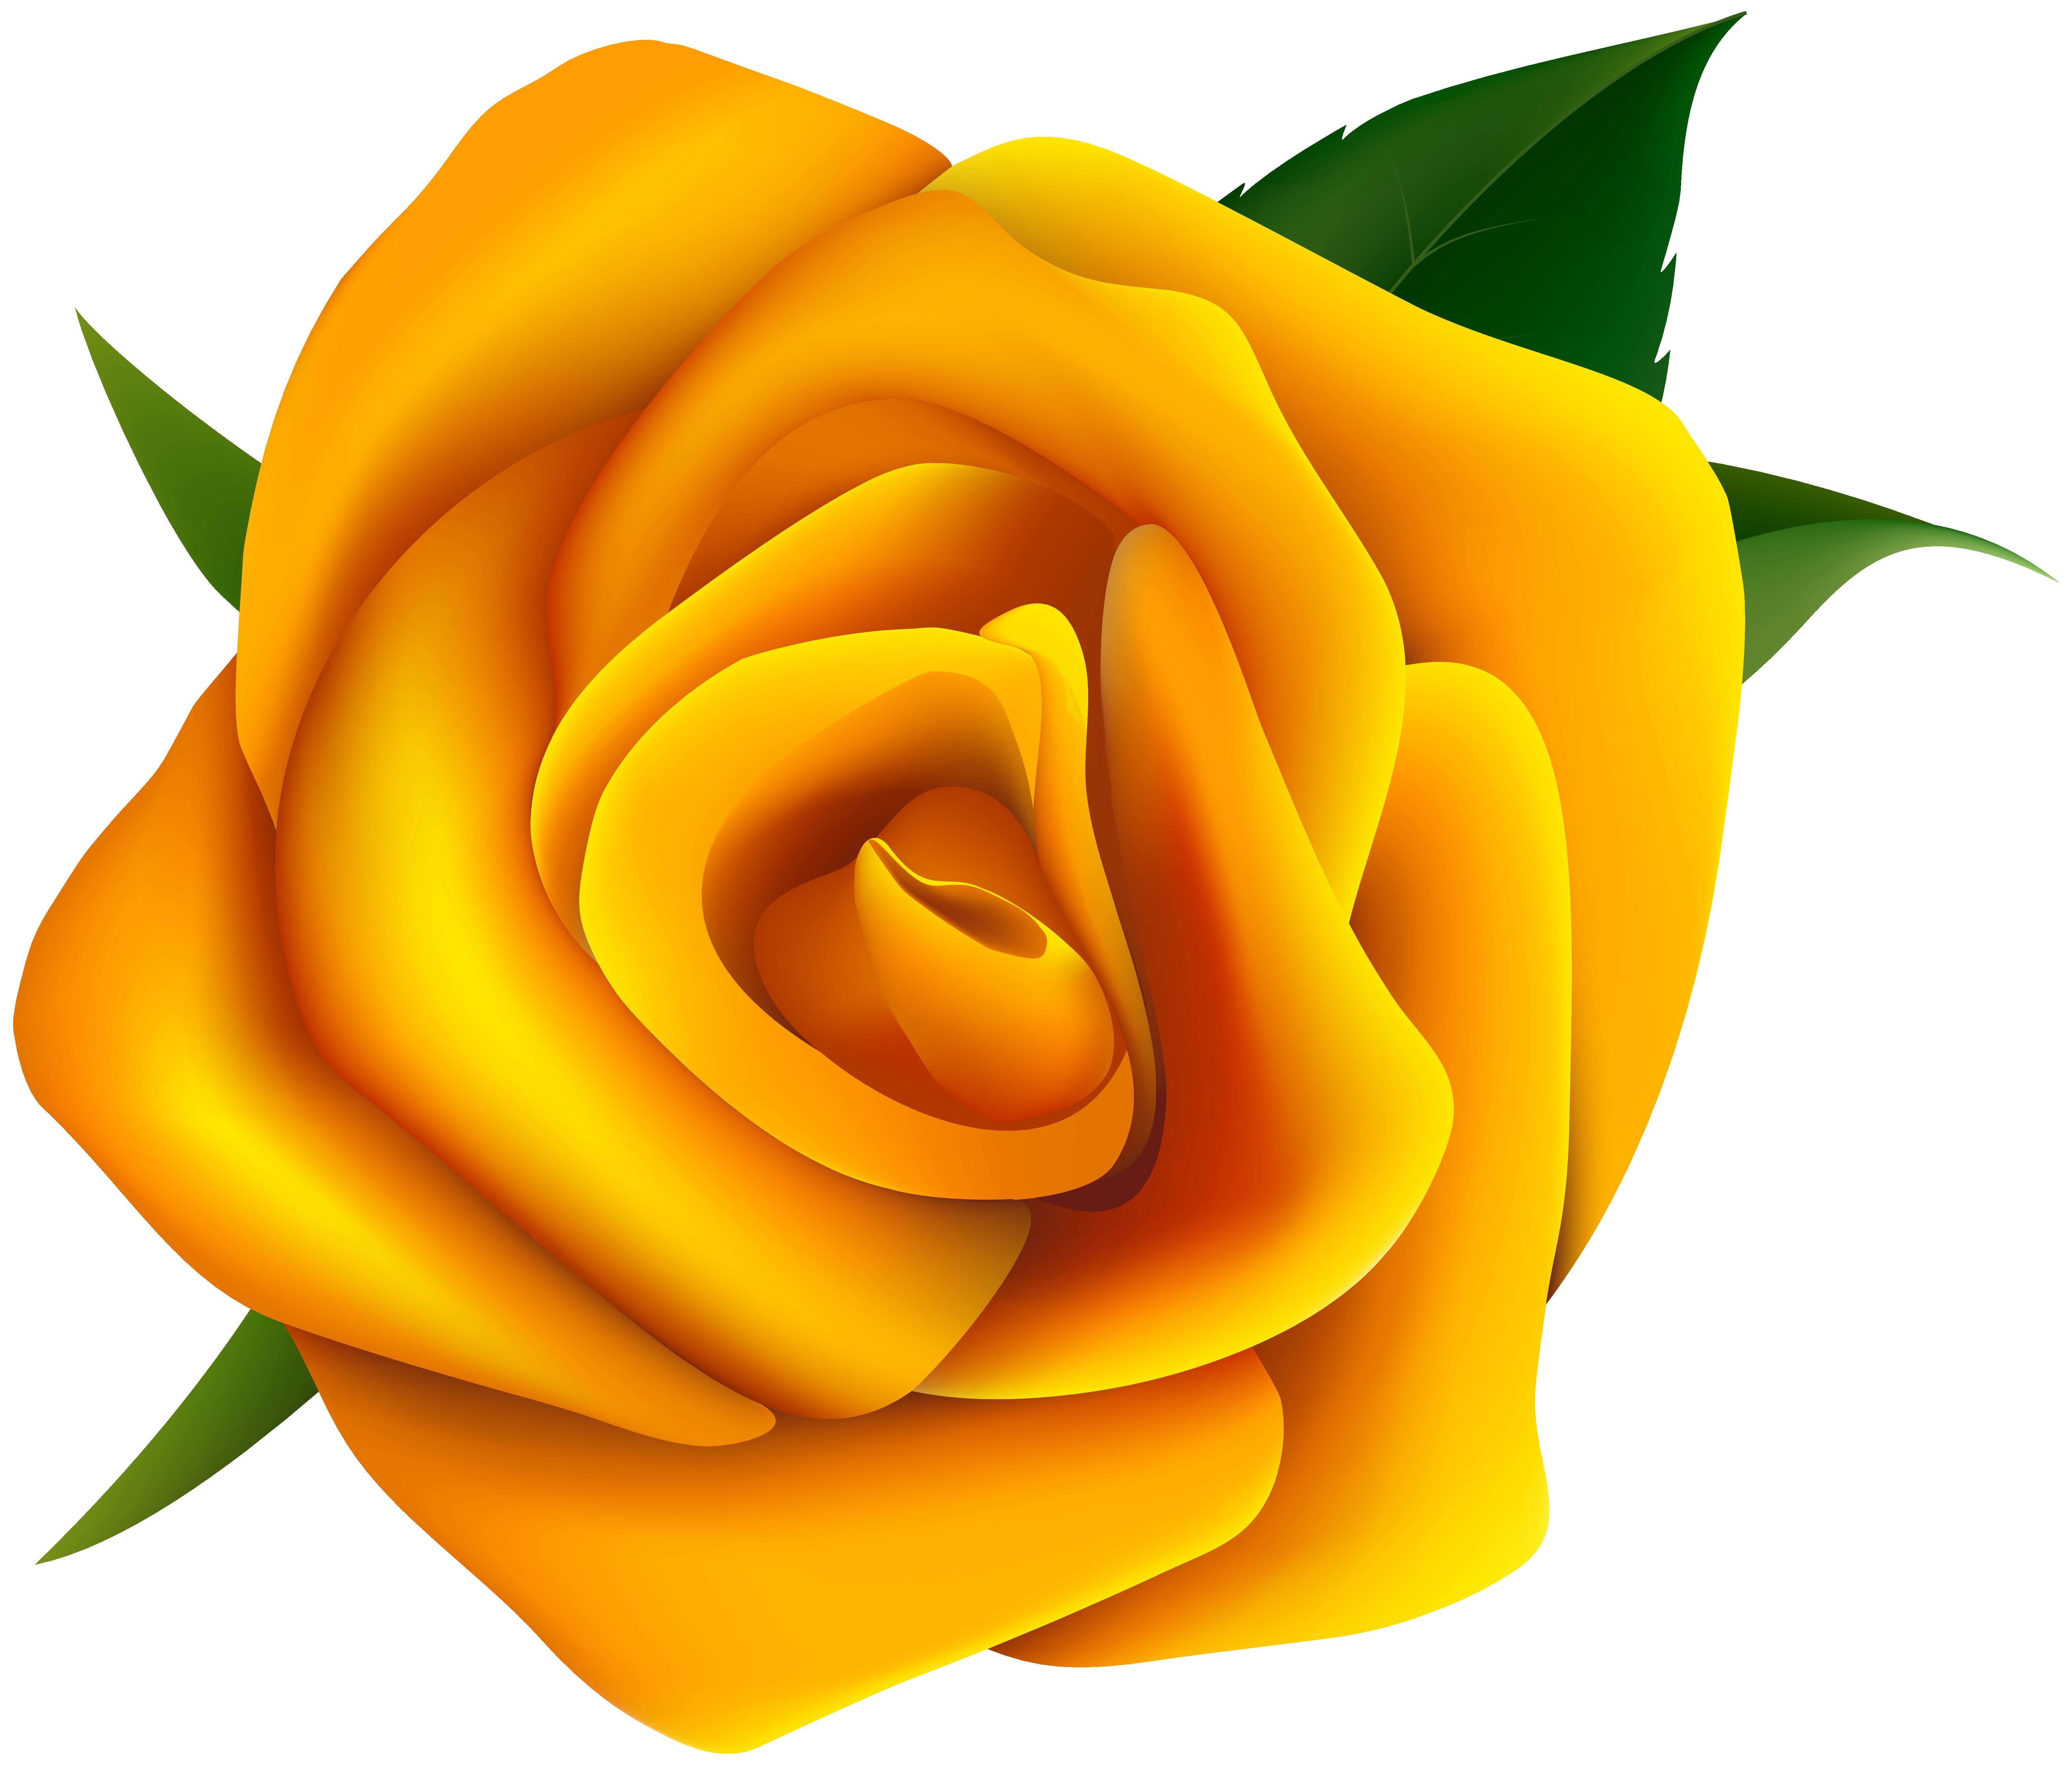 Flower clipart yellow jpg transparent download Yellow Rose Clipart PNG Image jpg transparent download